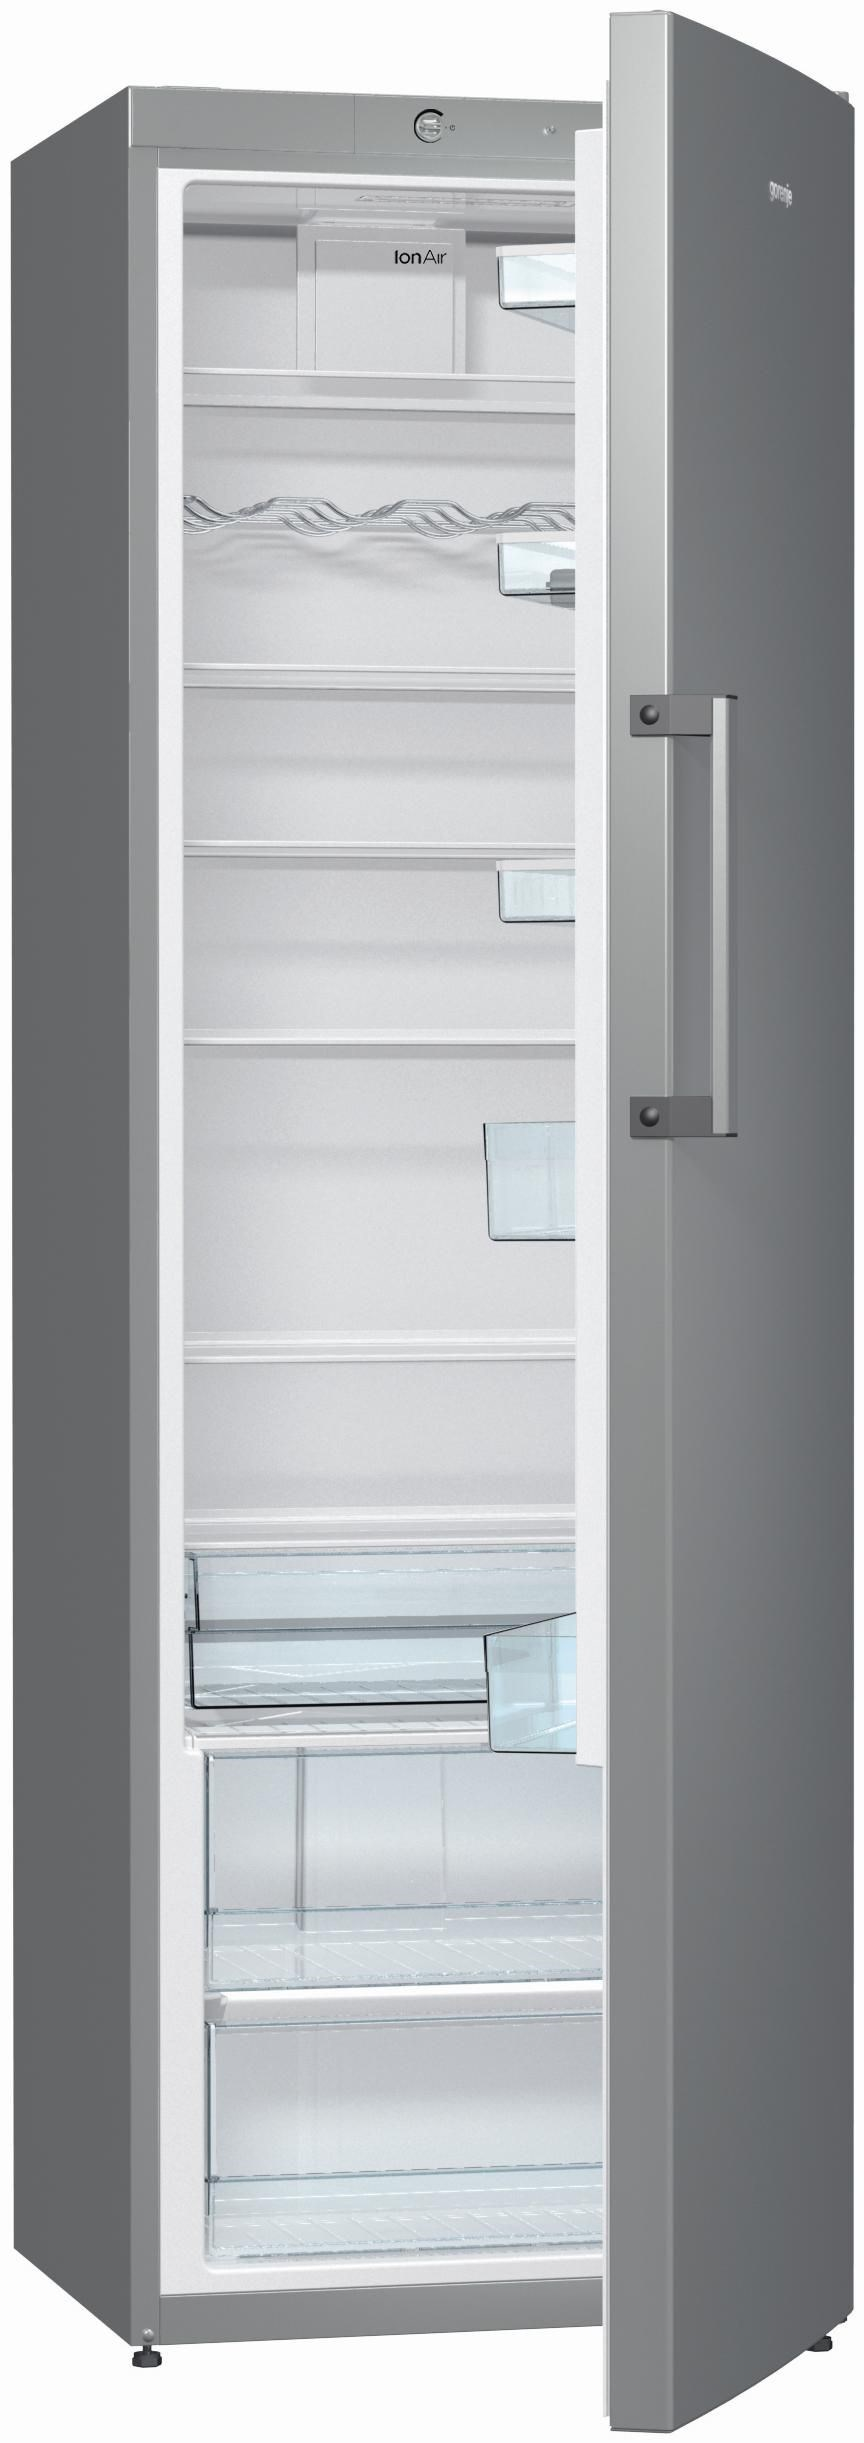 gorenje r6192fx inox vollraum k hlschrank h 185 cm b 60 cm a k hlschr nke computeruniverse. Black Bedroom Furniture Sets. Home Design Ideas